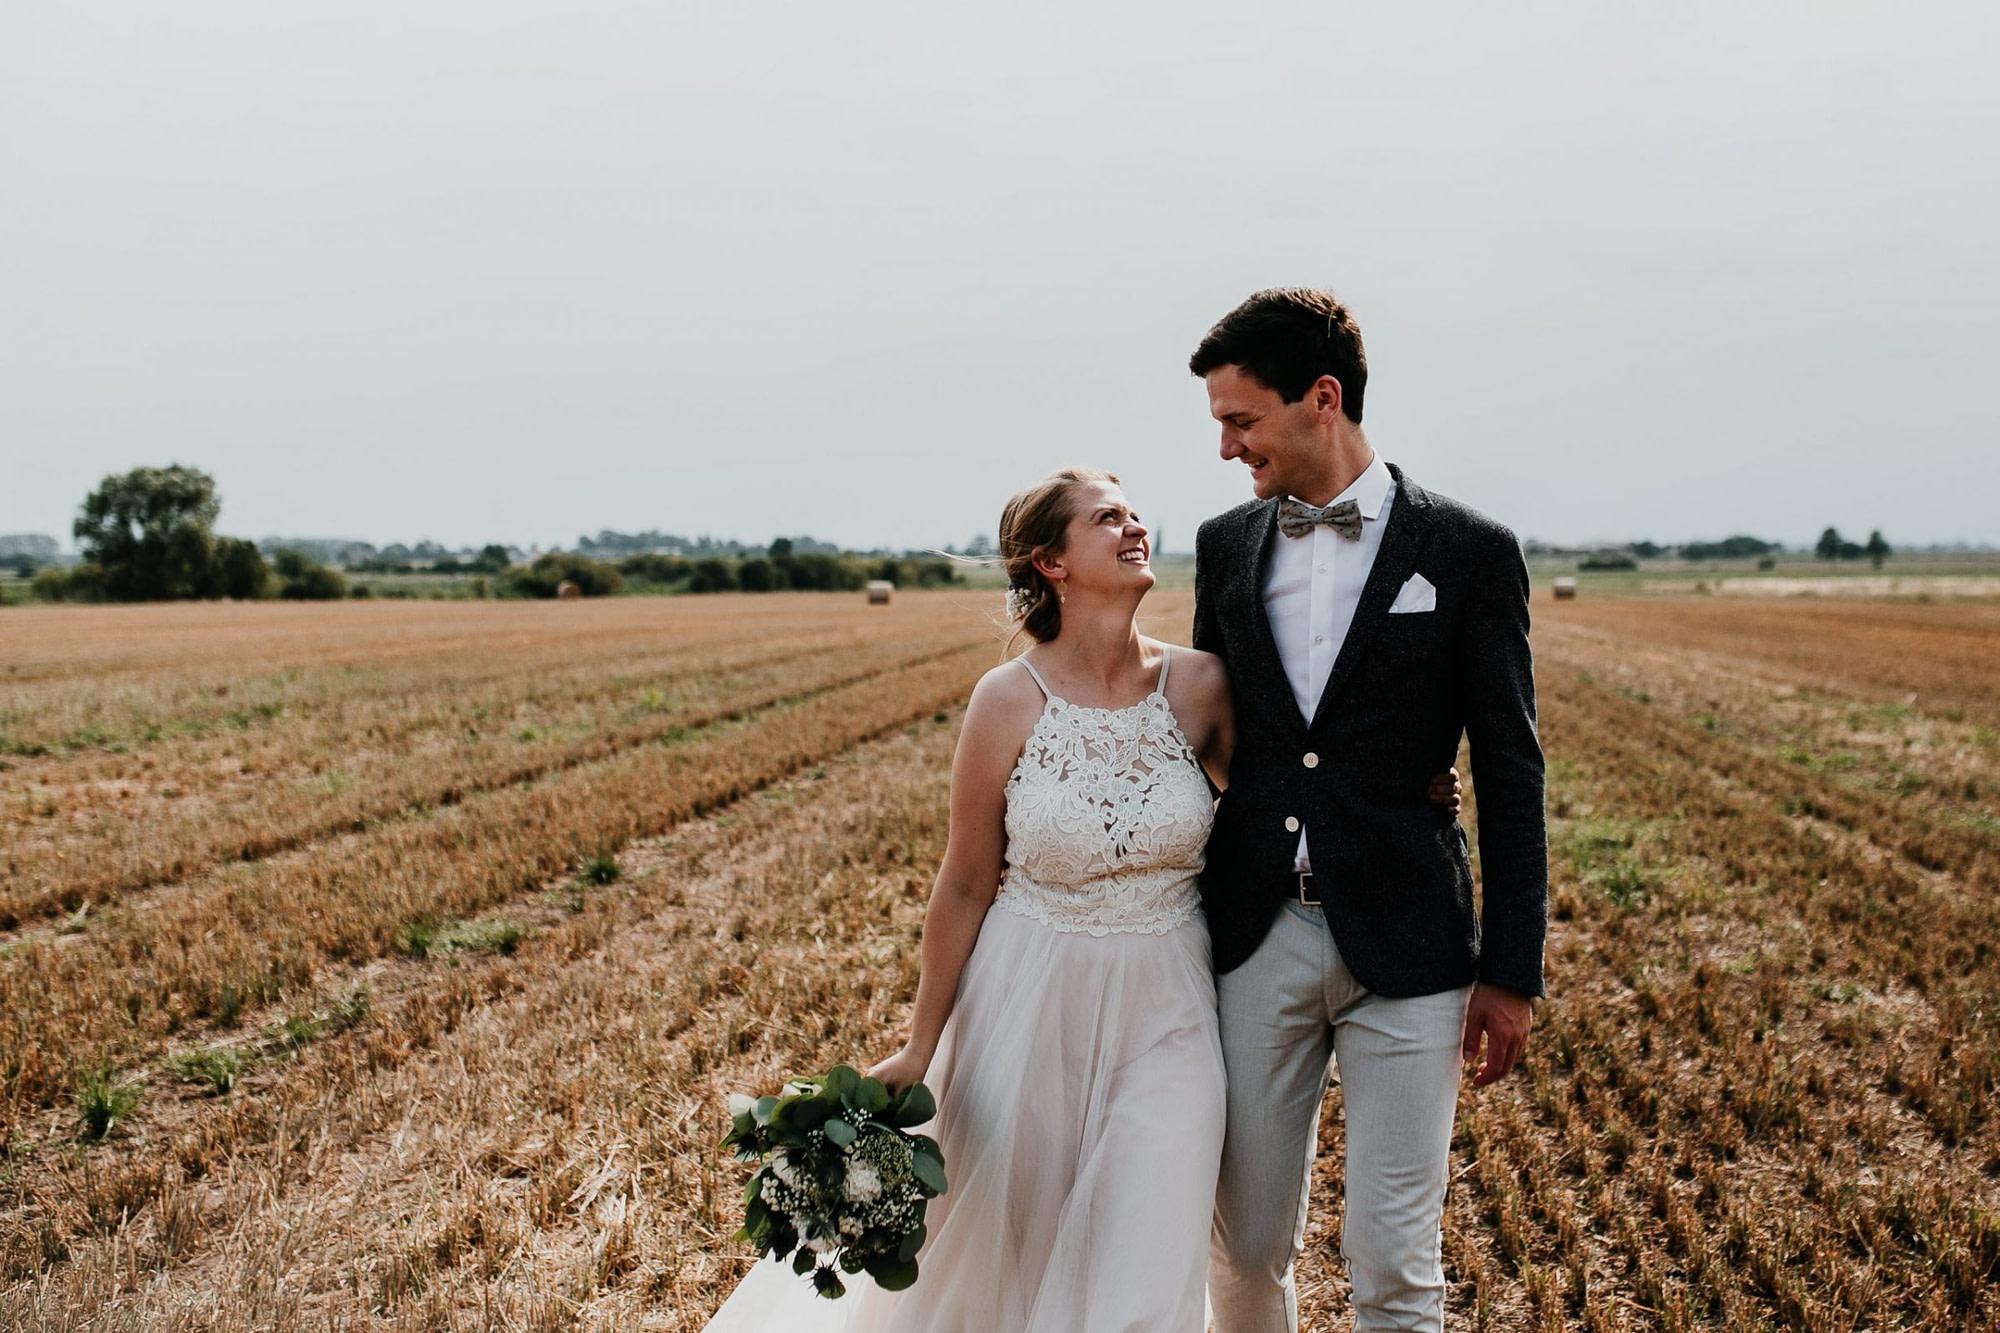 Hochzeit berlin, mühle tornow, muehle tornow, tornow, paarshooting, couple shooting, hochzeitsfotograf berlin, wedding couple shooting, field, feld